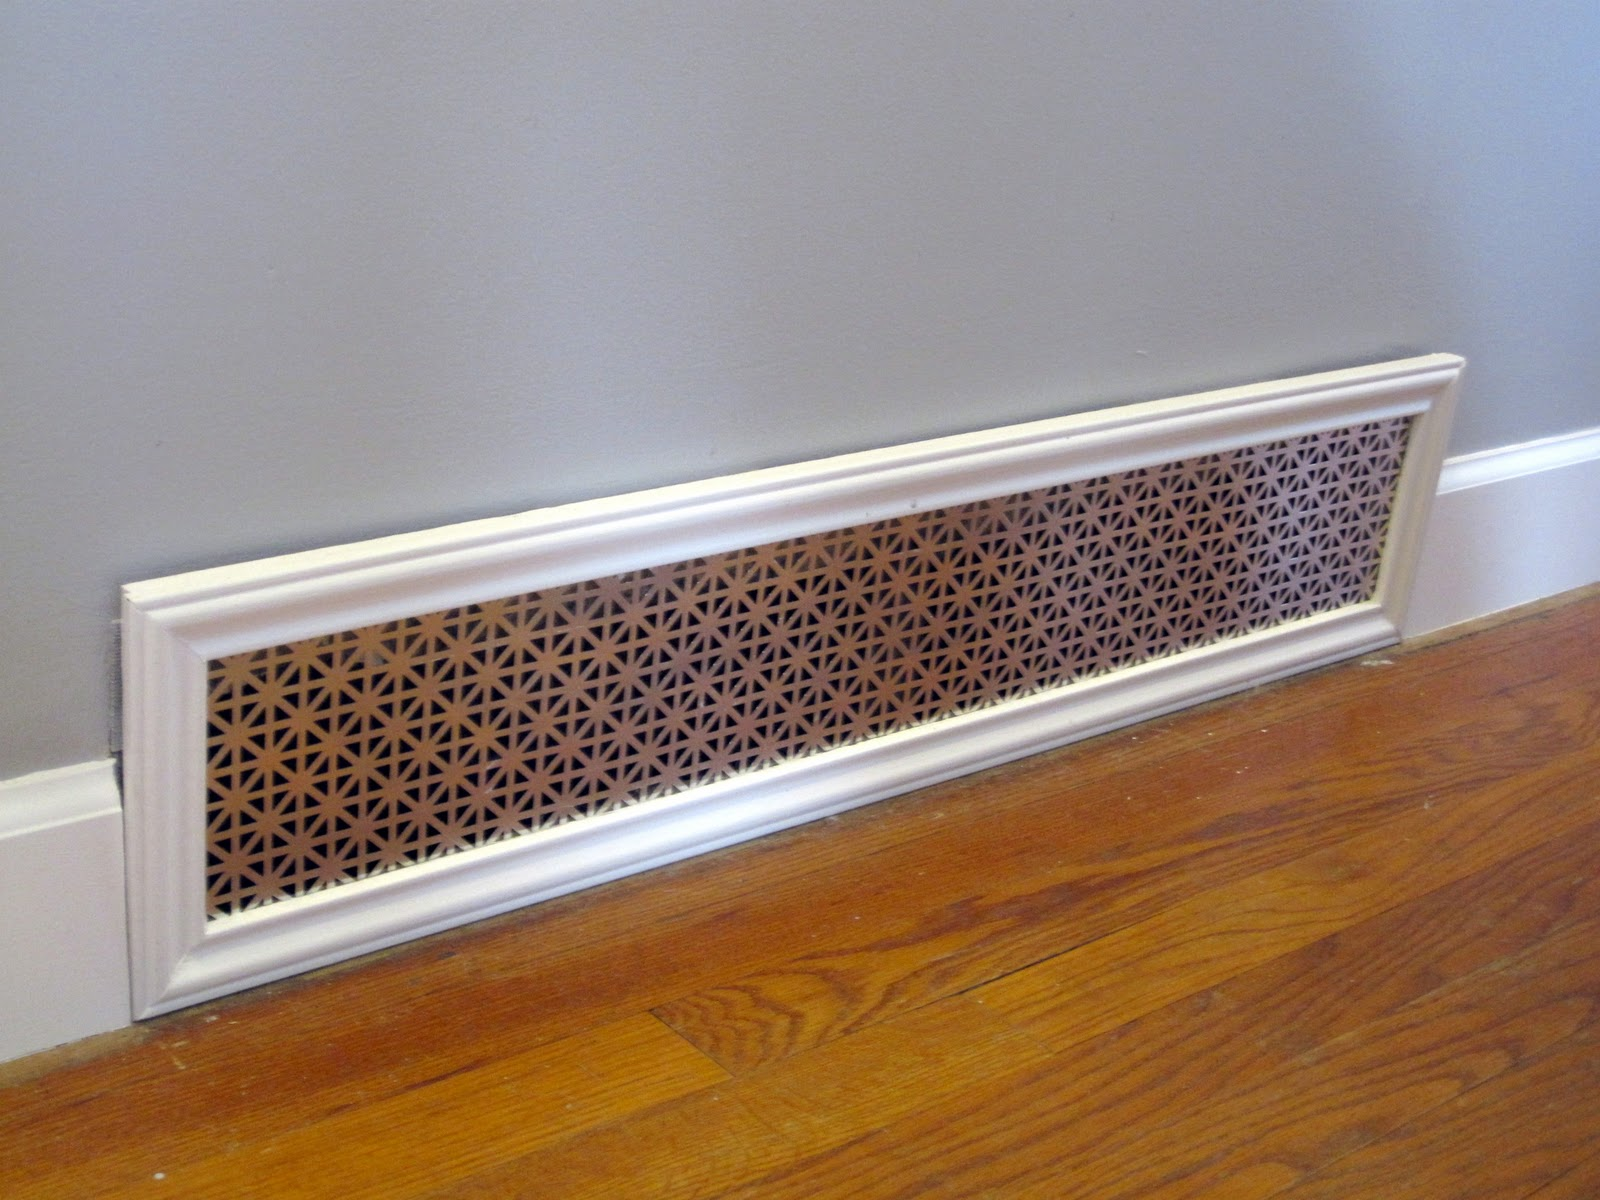 Decorative Wall Vent Covers Decor Ideasdecor Ideas